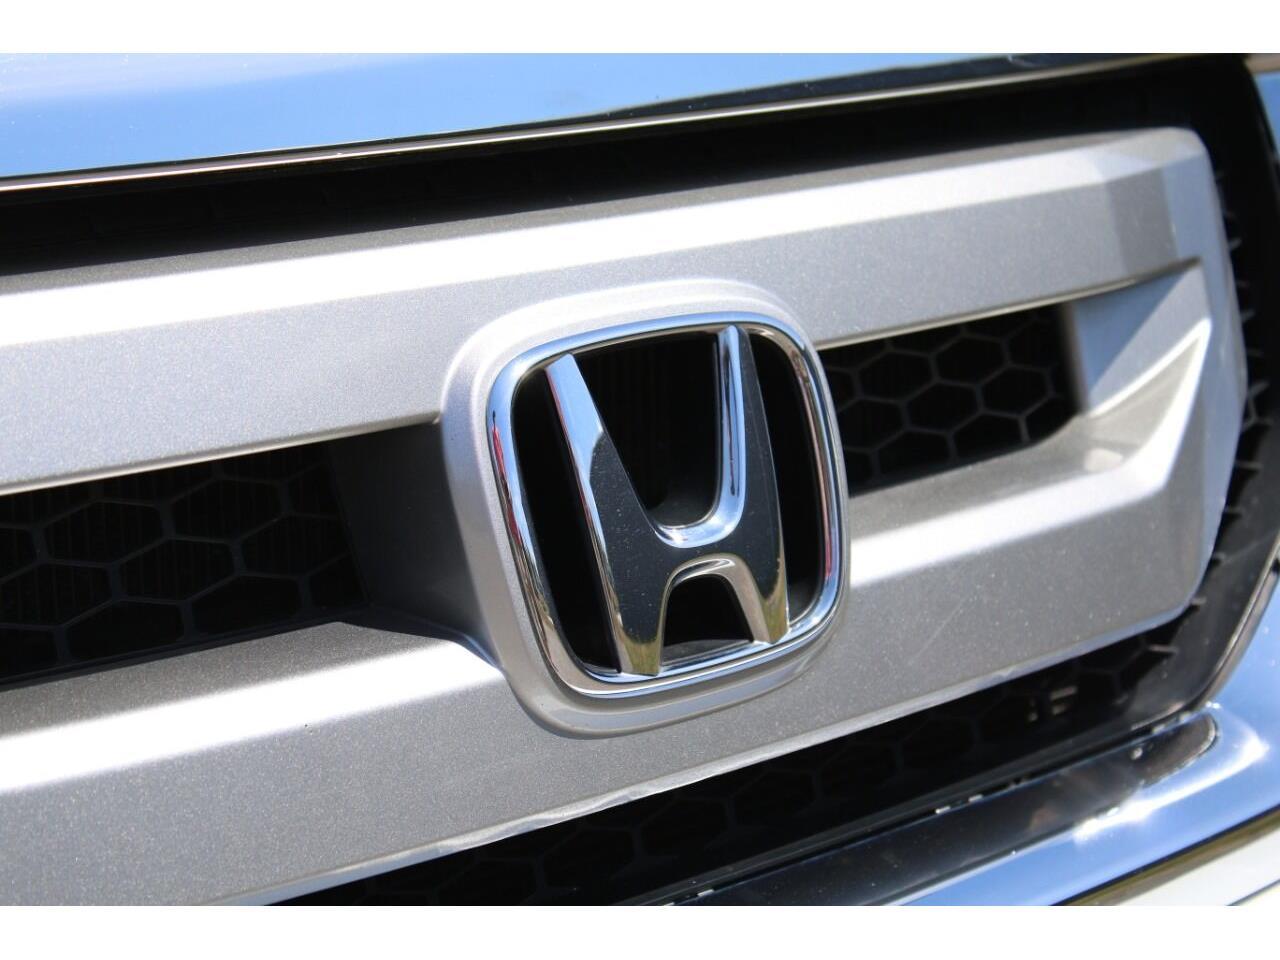 2011 Honda Pilot (CC-1365806) for sale in Hilton, New York